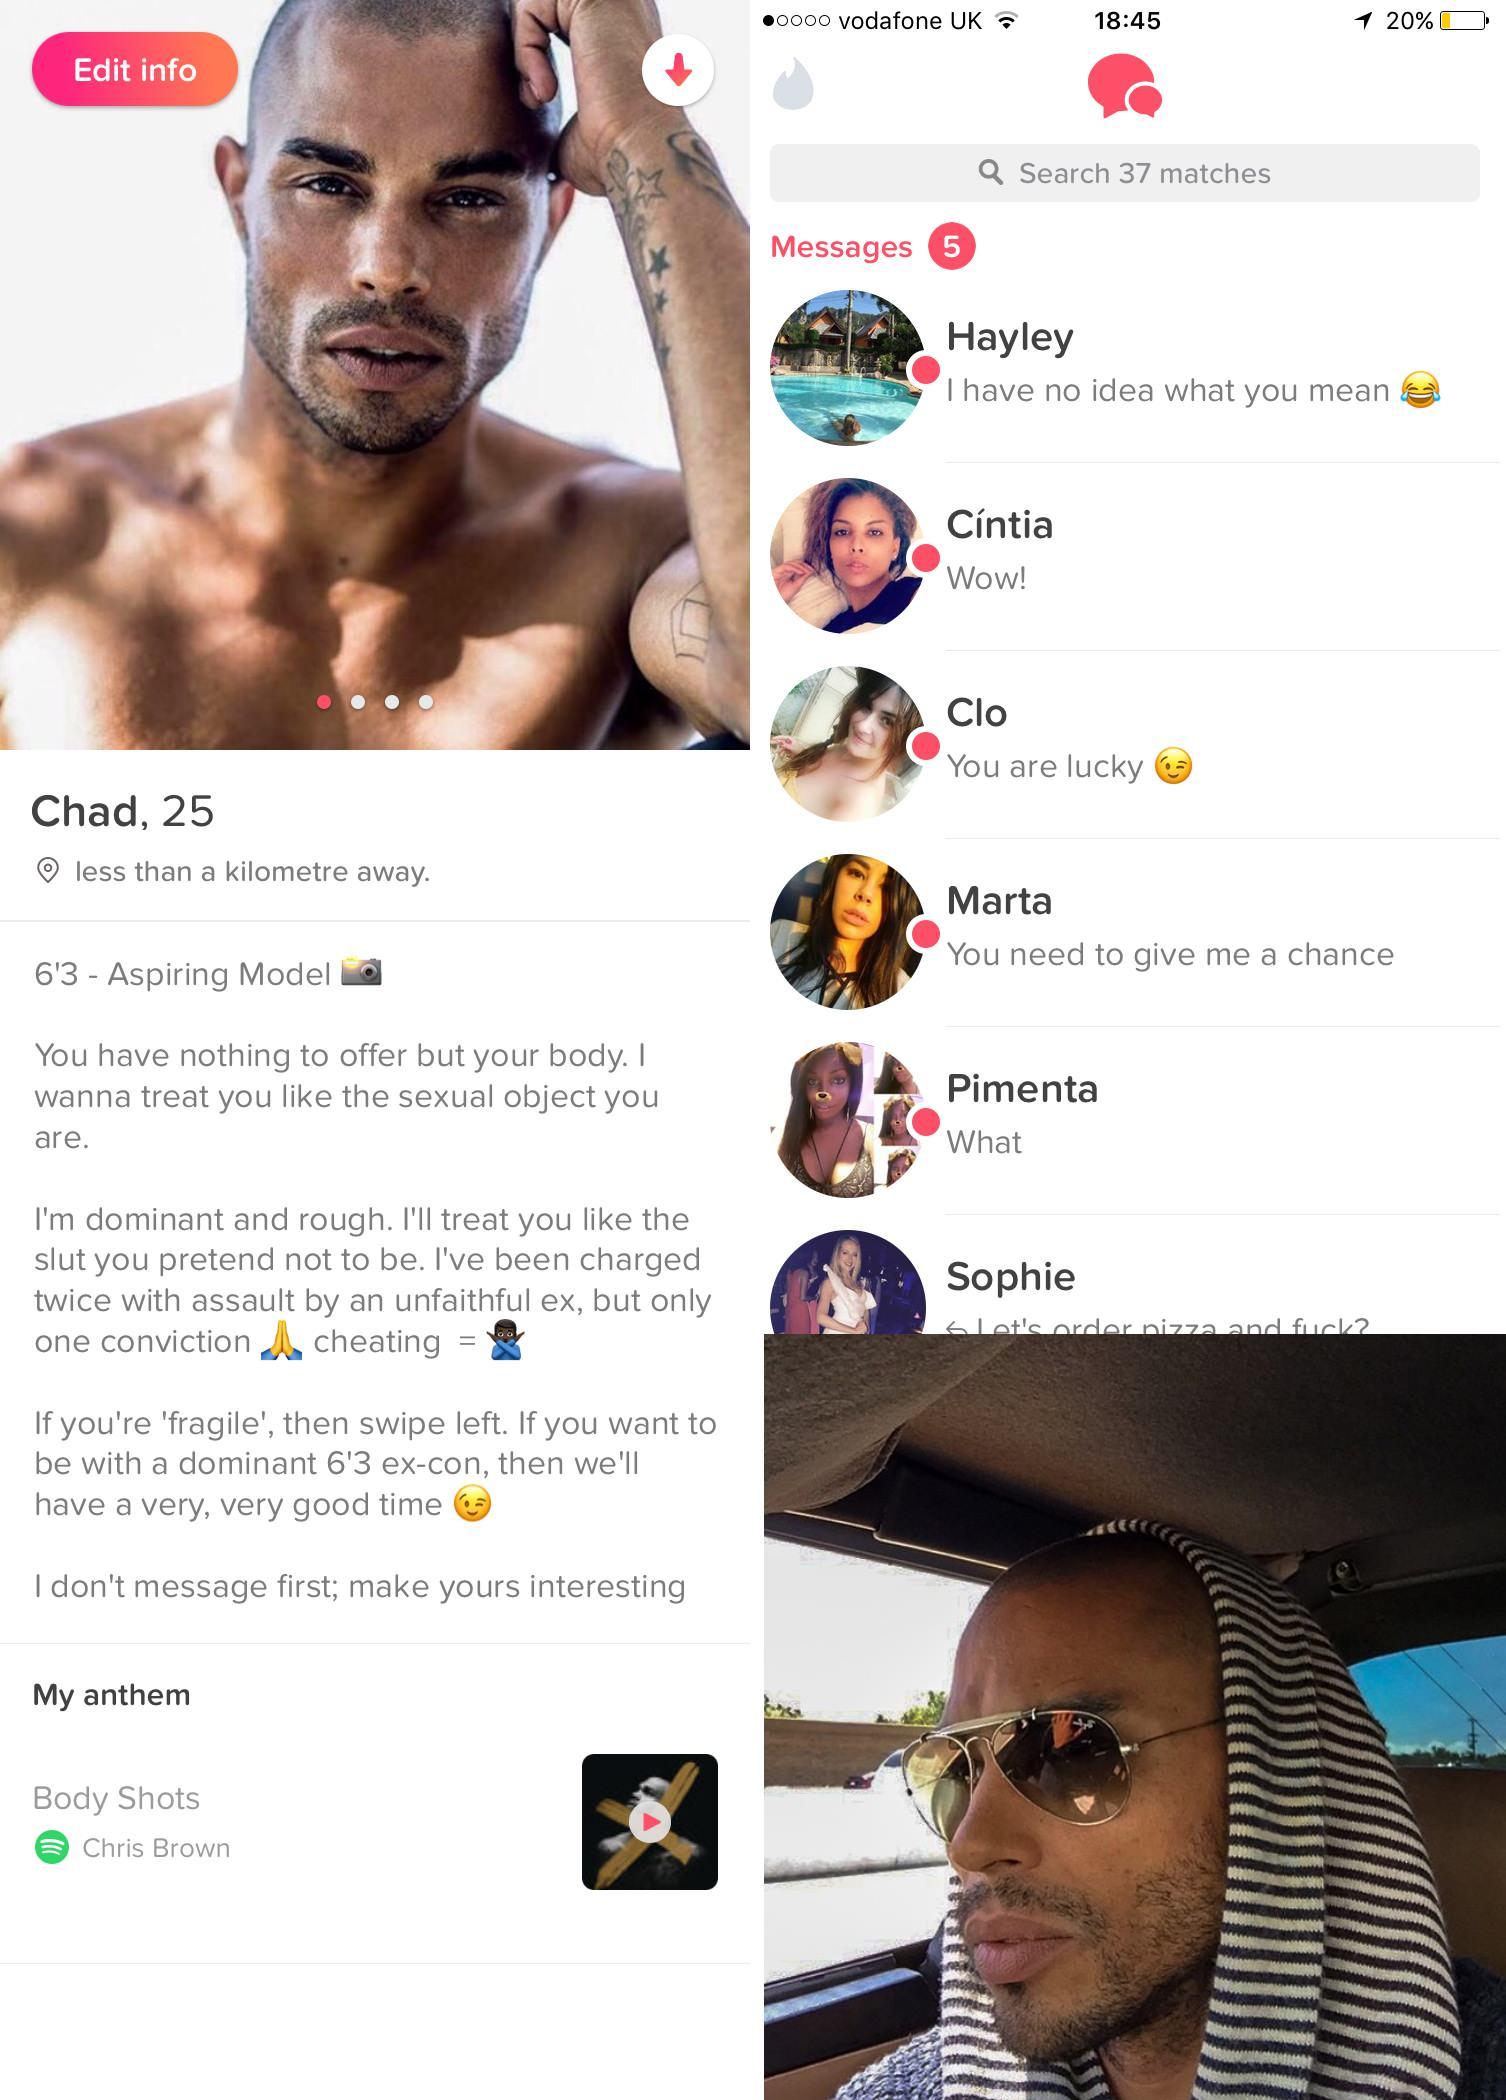 Tinder fake profile experiment